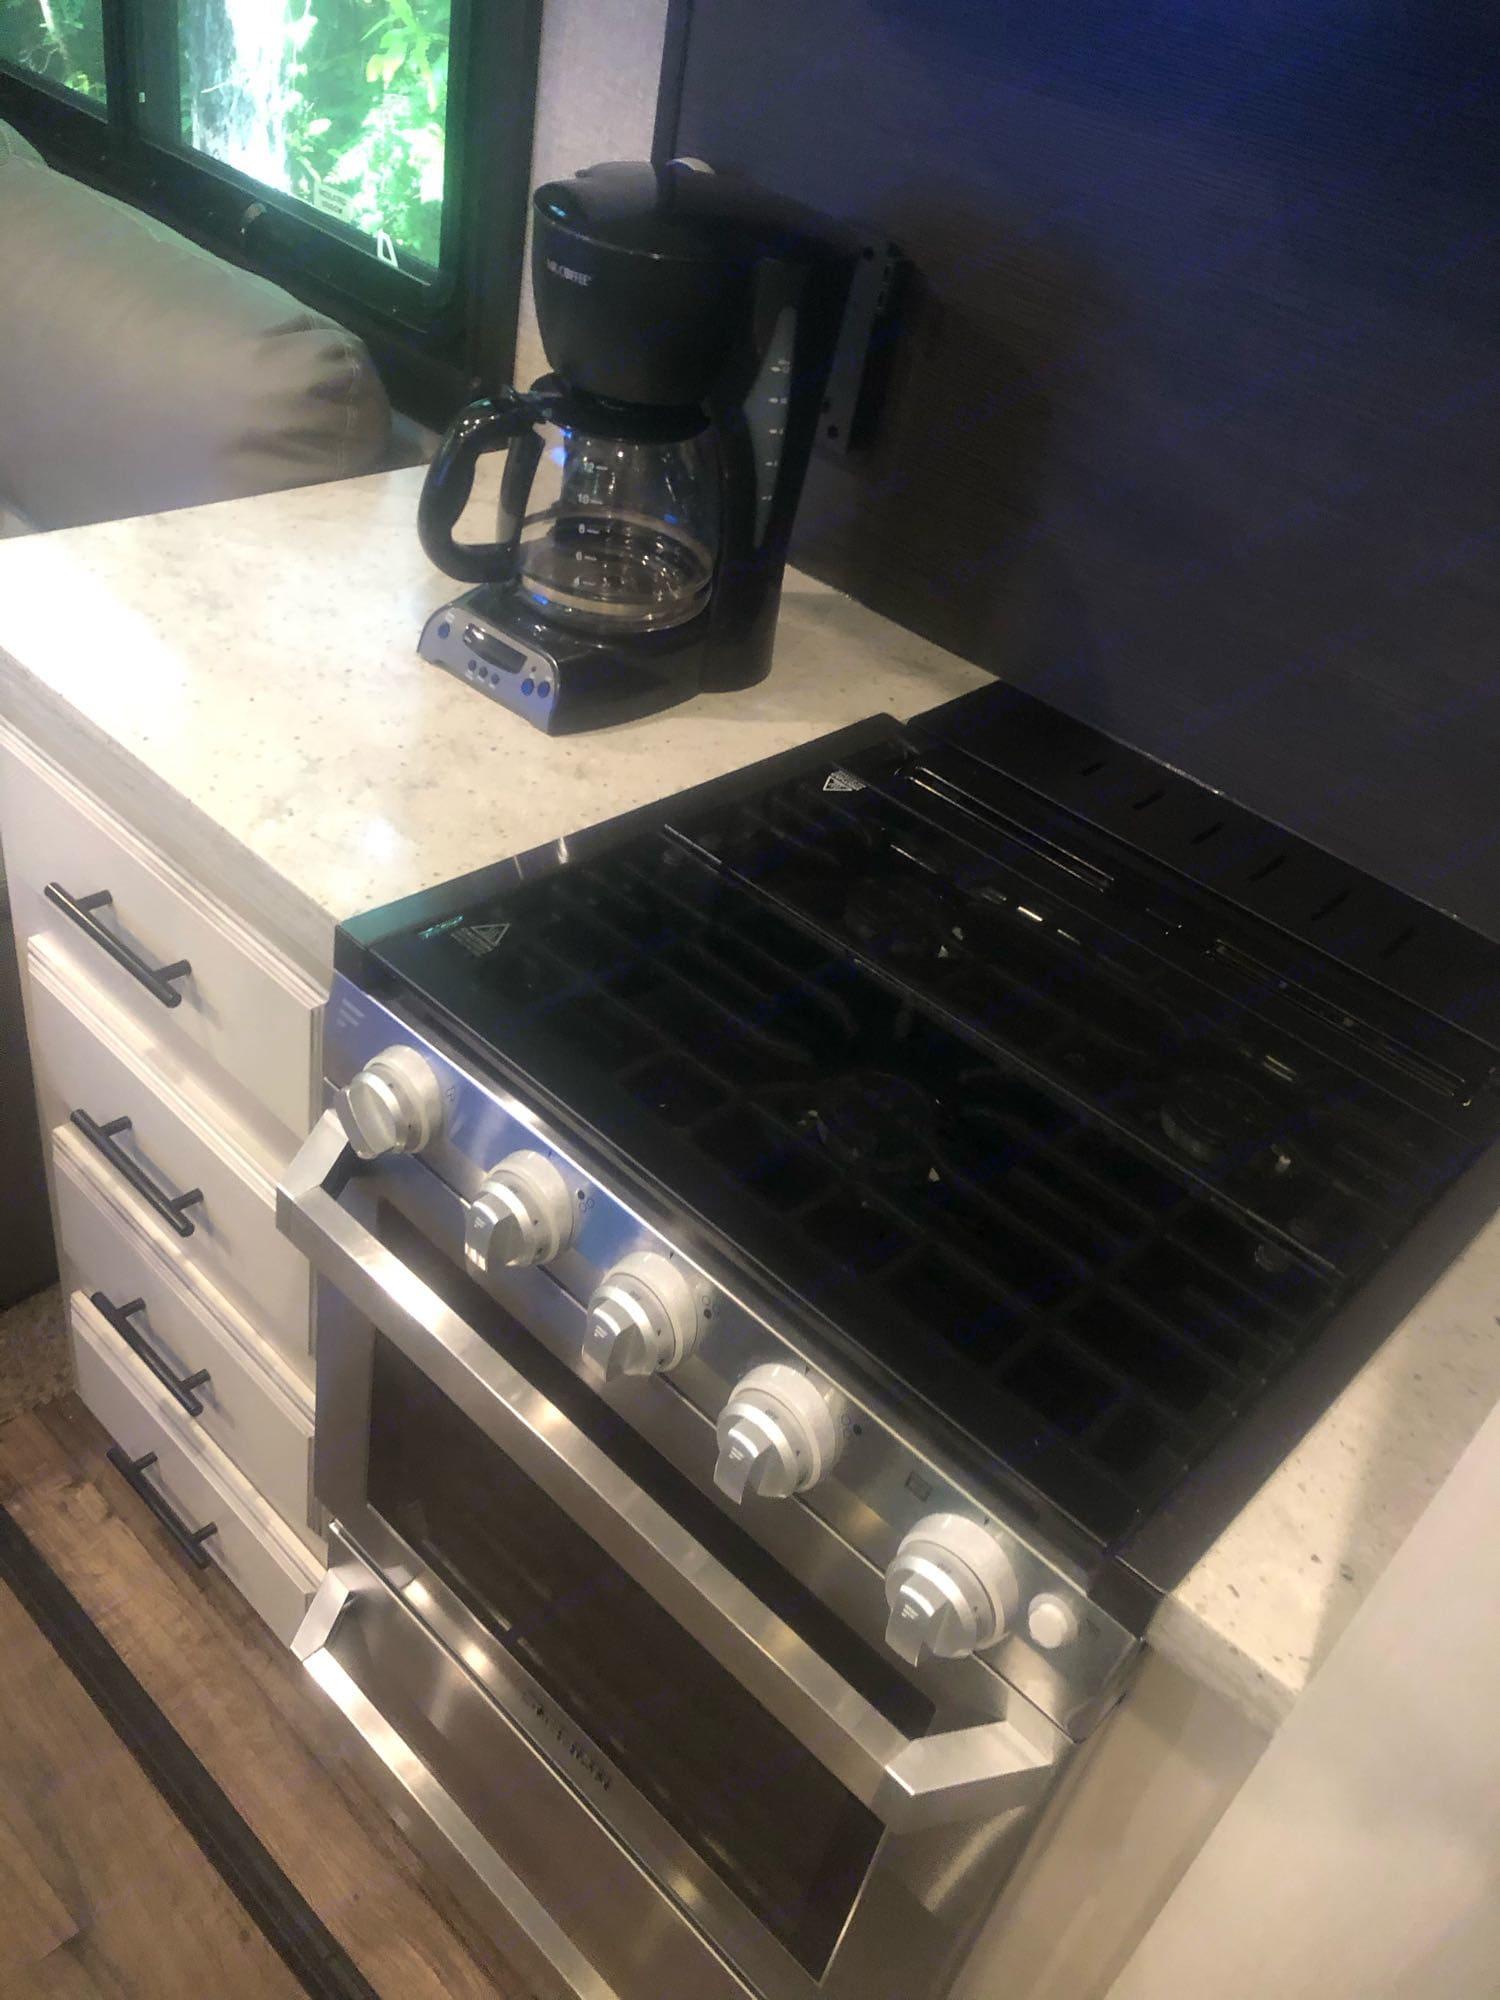 3 burner stove oven combo. Standard coffee pot. Jayco Eagle 2020